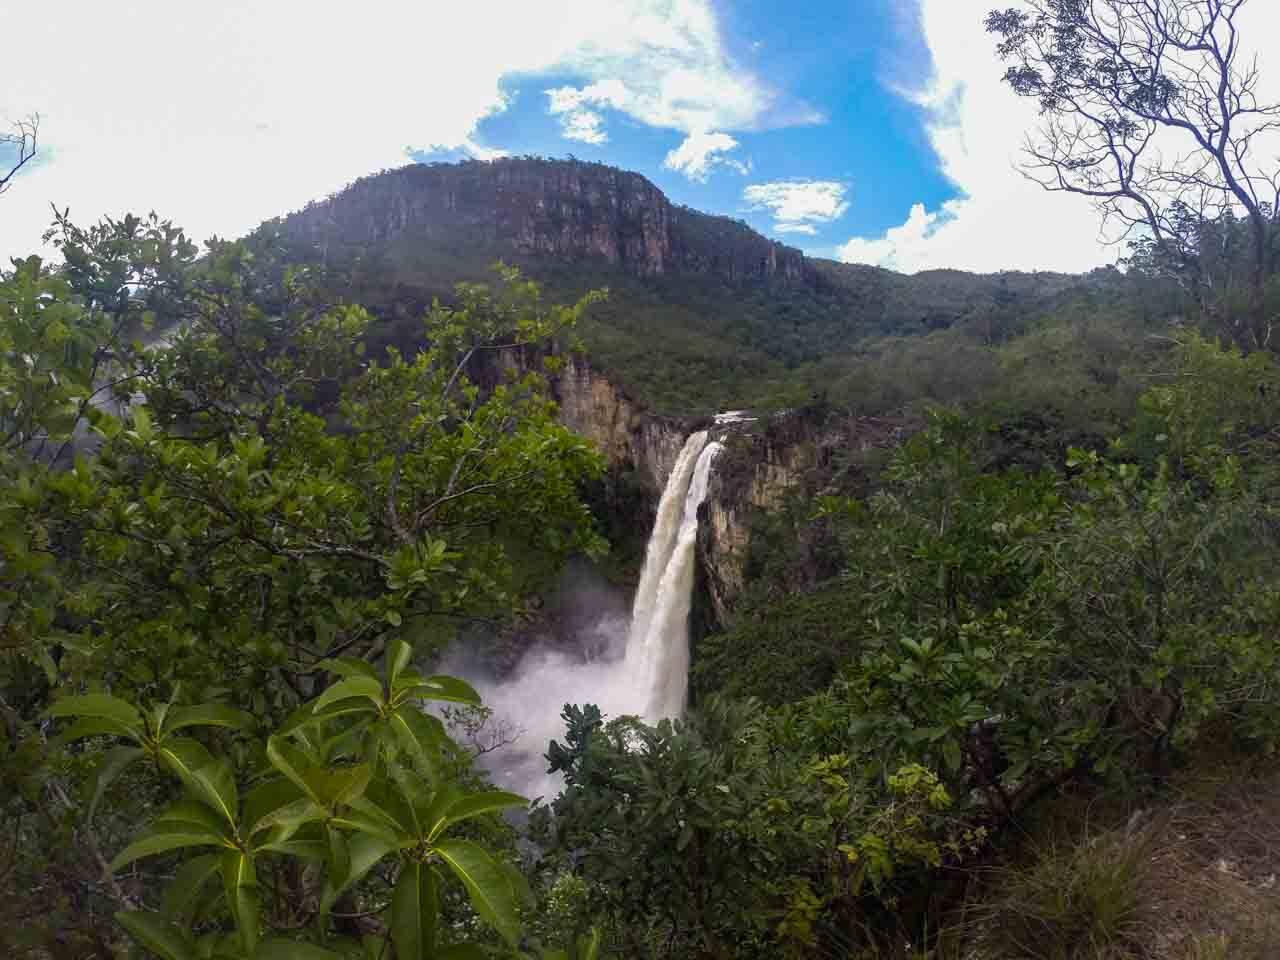 Cachoeira maravilhosa na Chapada dos Veadeiros.